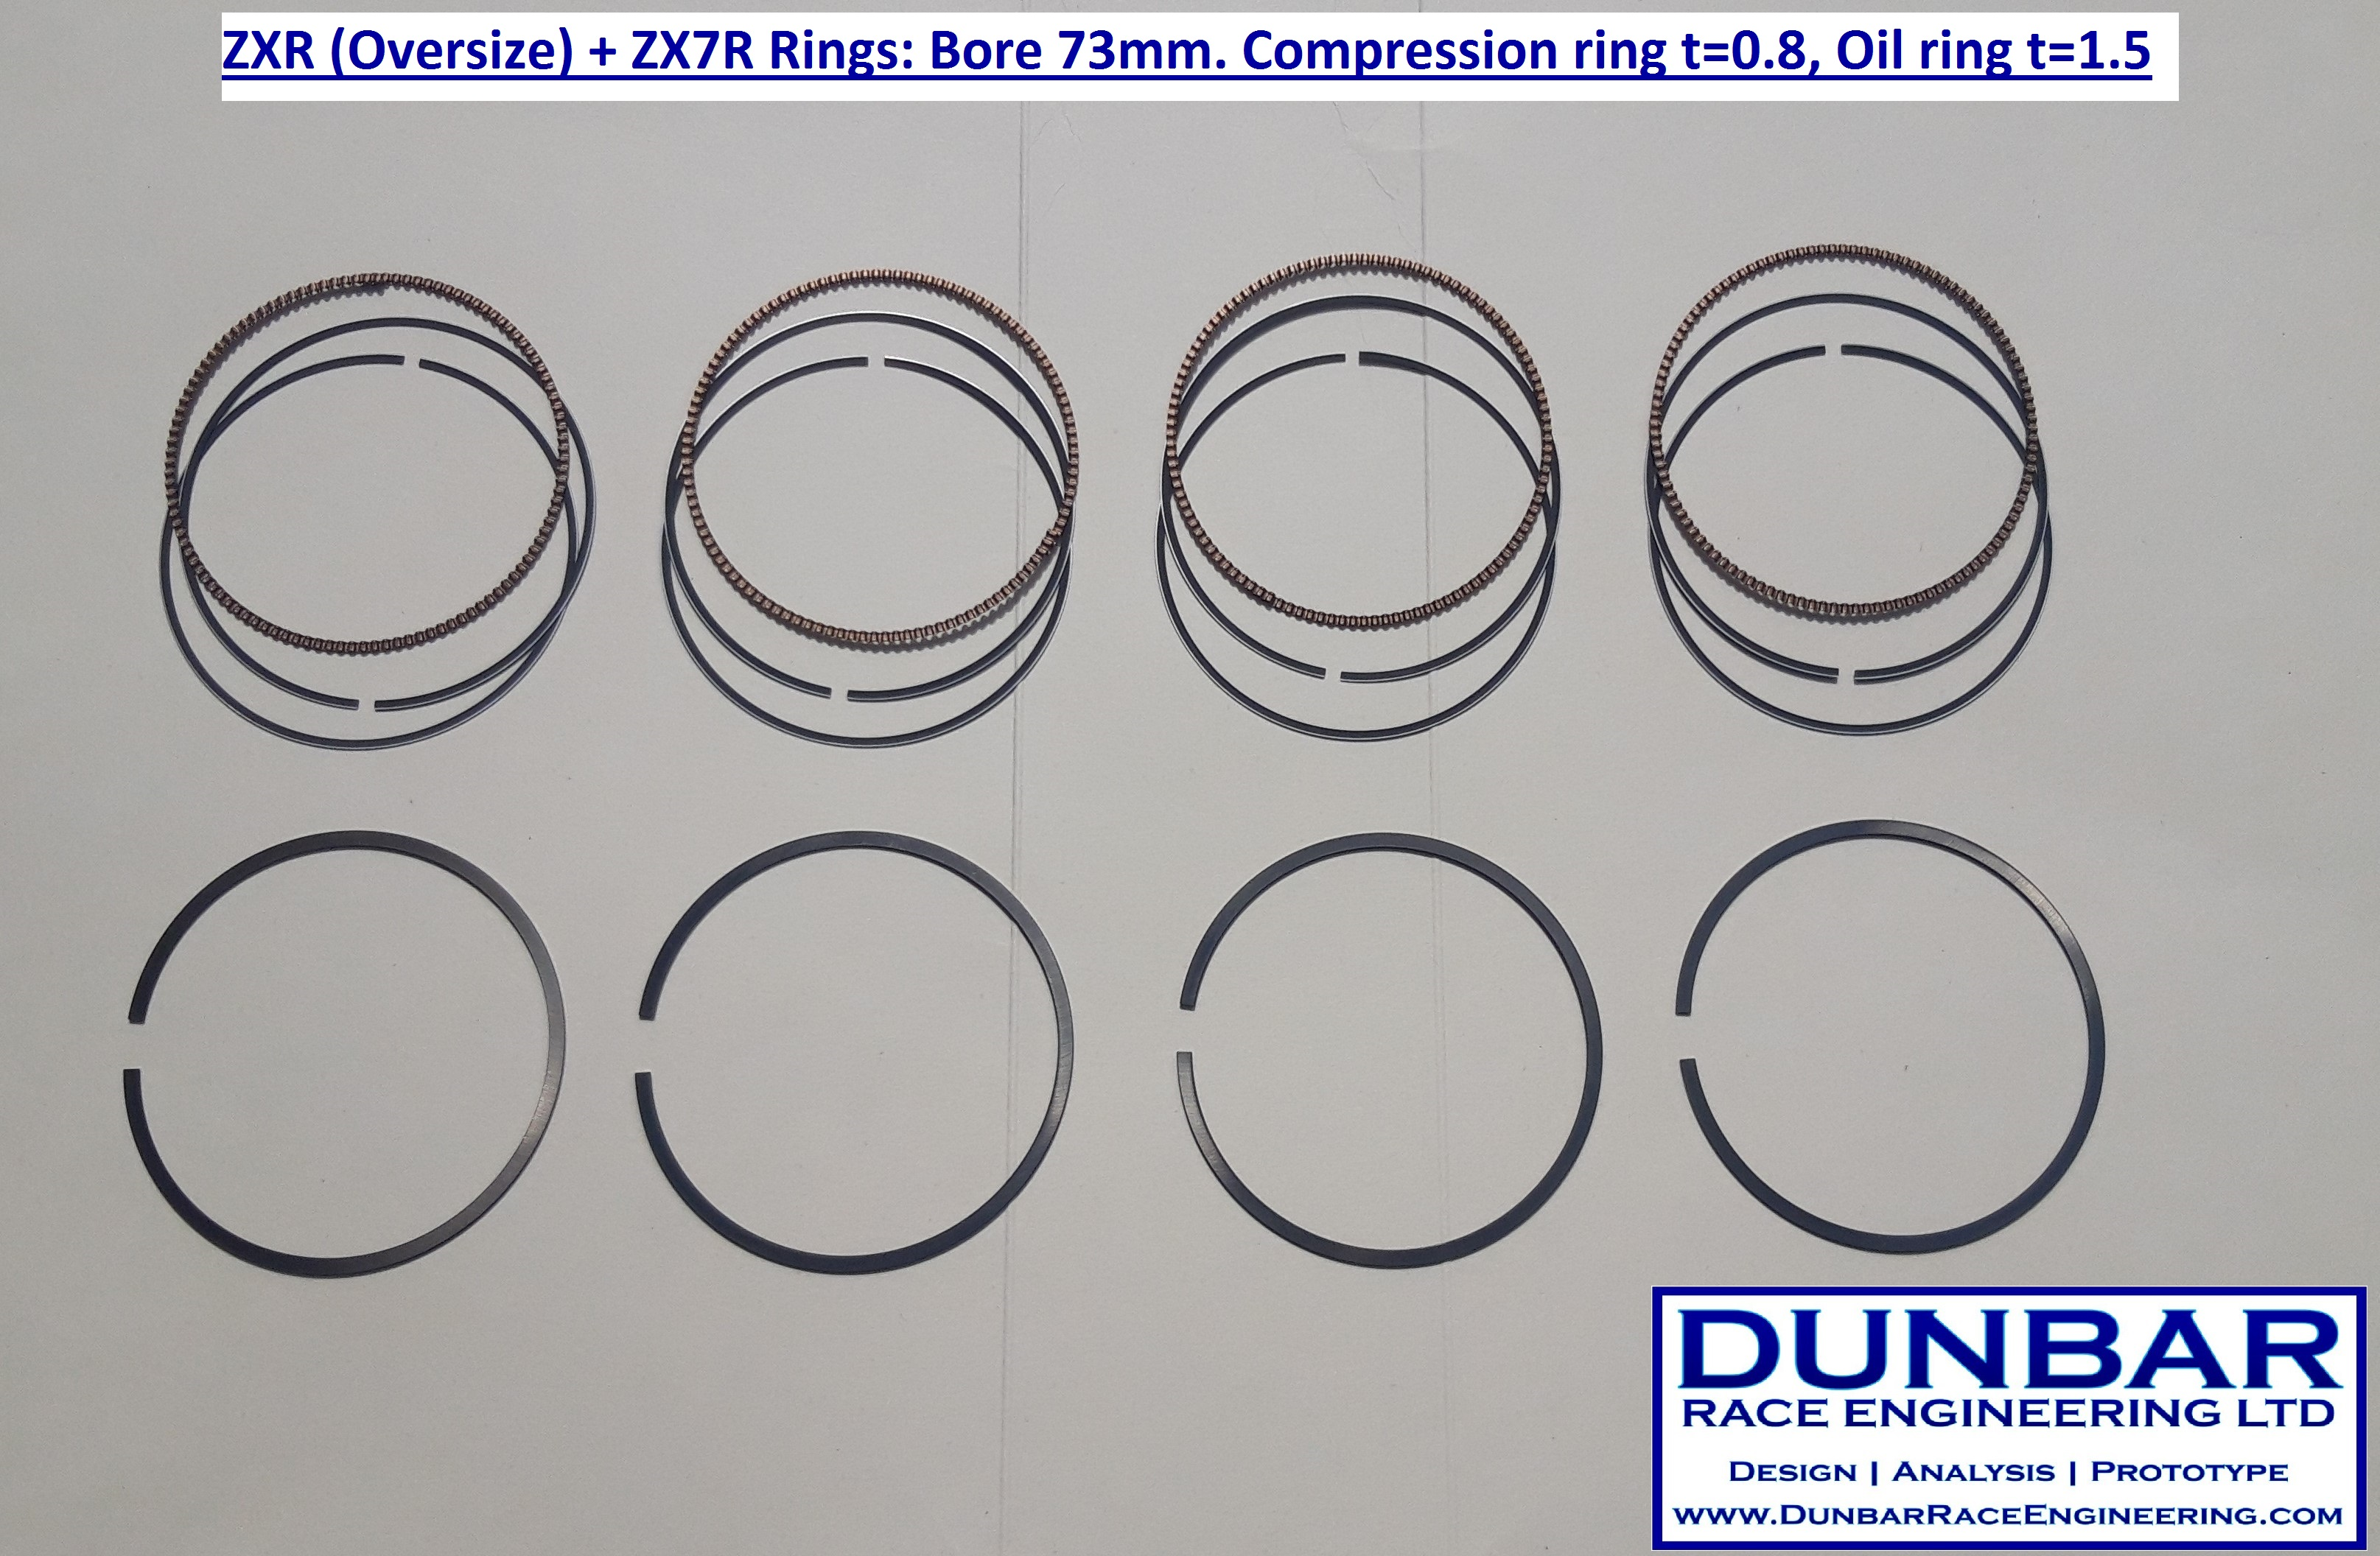 Piston Rings Bore 73mm